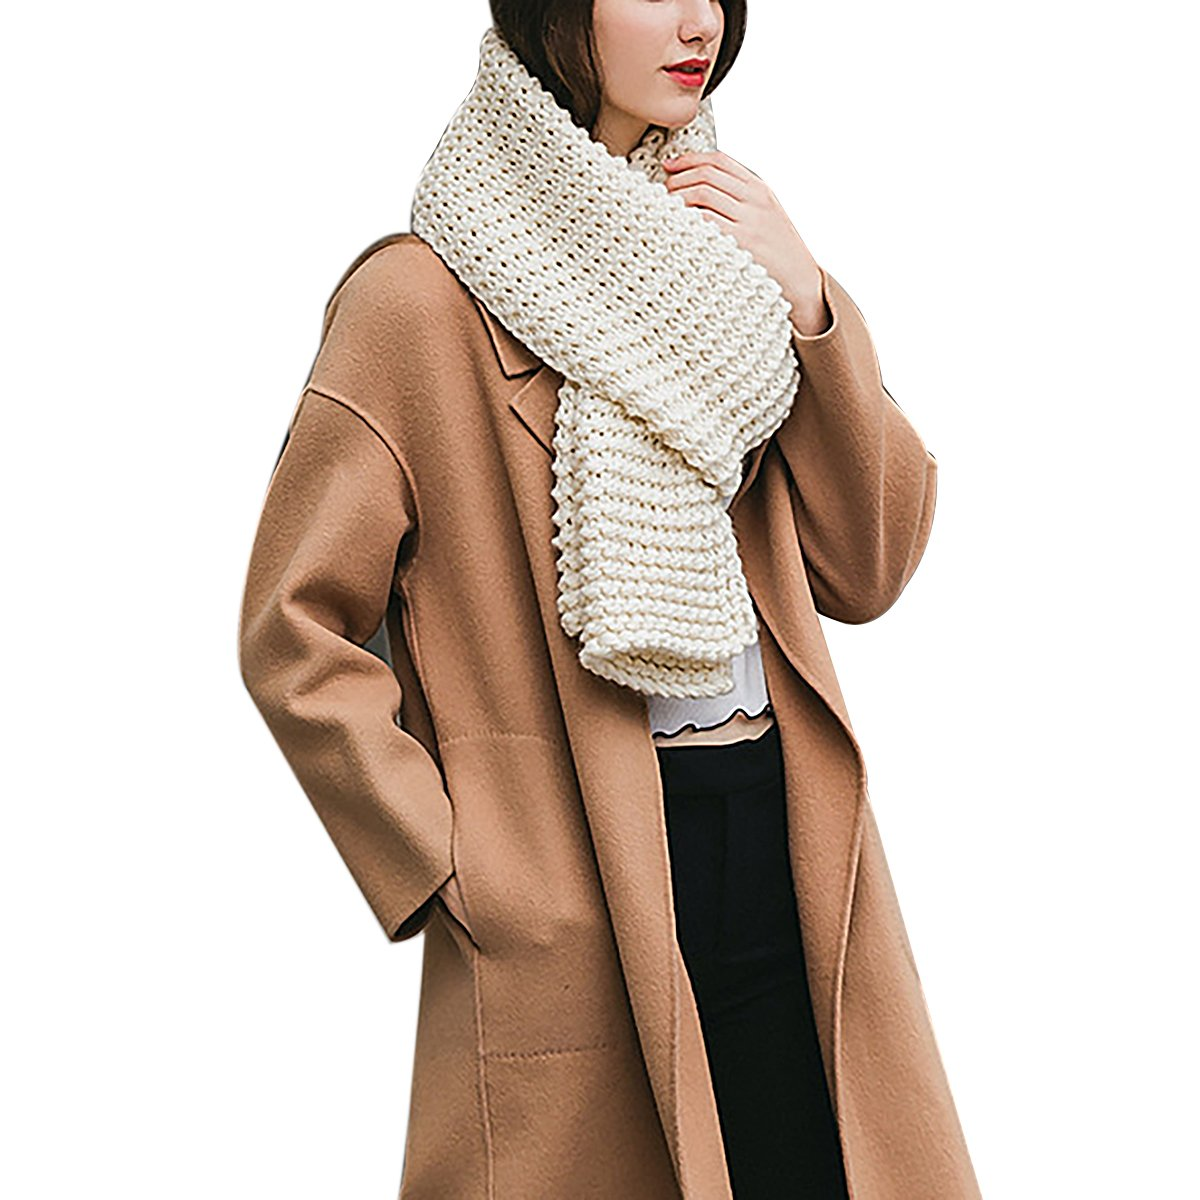 Women Men Elegant Winter Long Warm Scarf Thick Wrap Chunky Knit Scarf